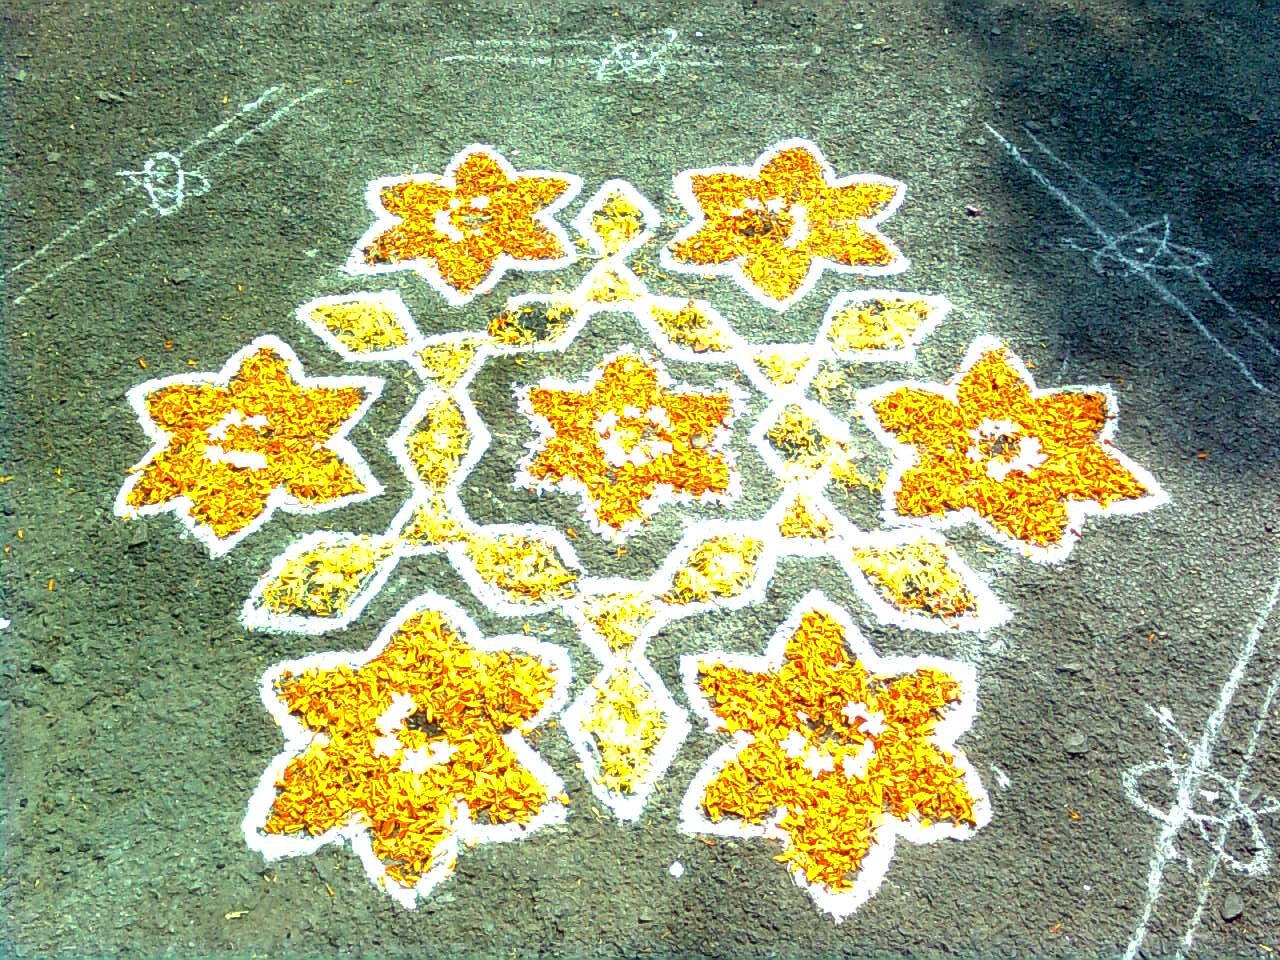 Sankranti_Muggu_with_flowers_at_Nizampet.jpg